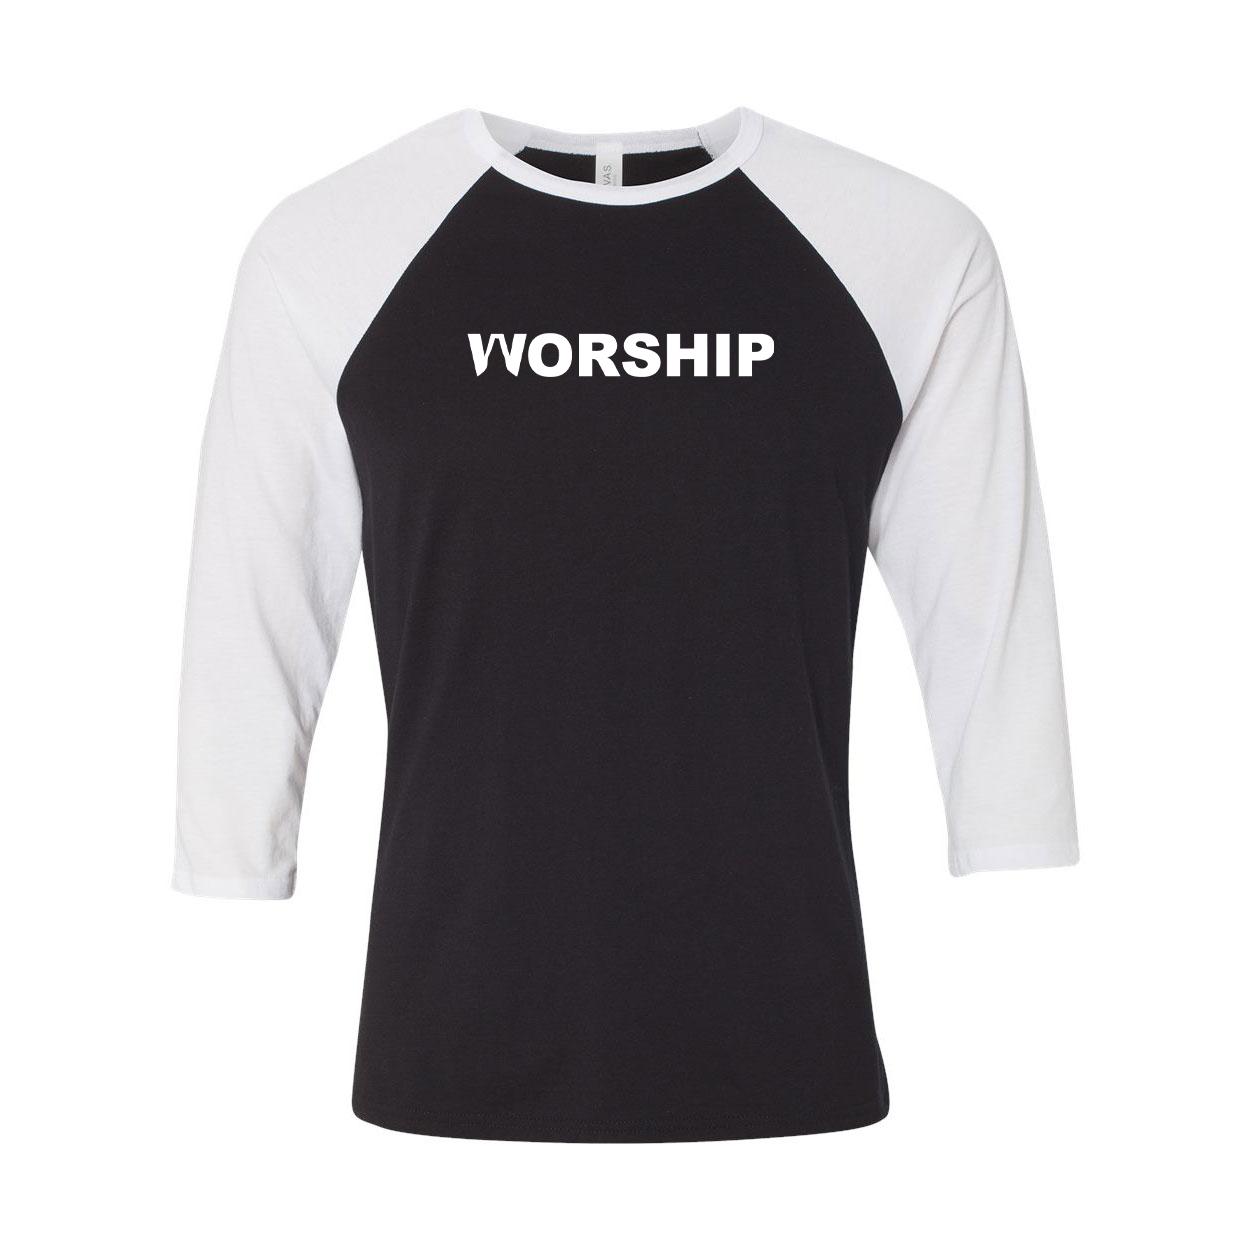 Worship Pray Logo Classic Raglan Shirt Black/White (White Logo)